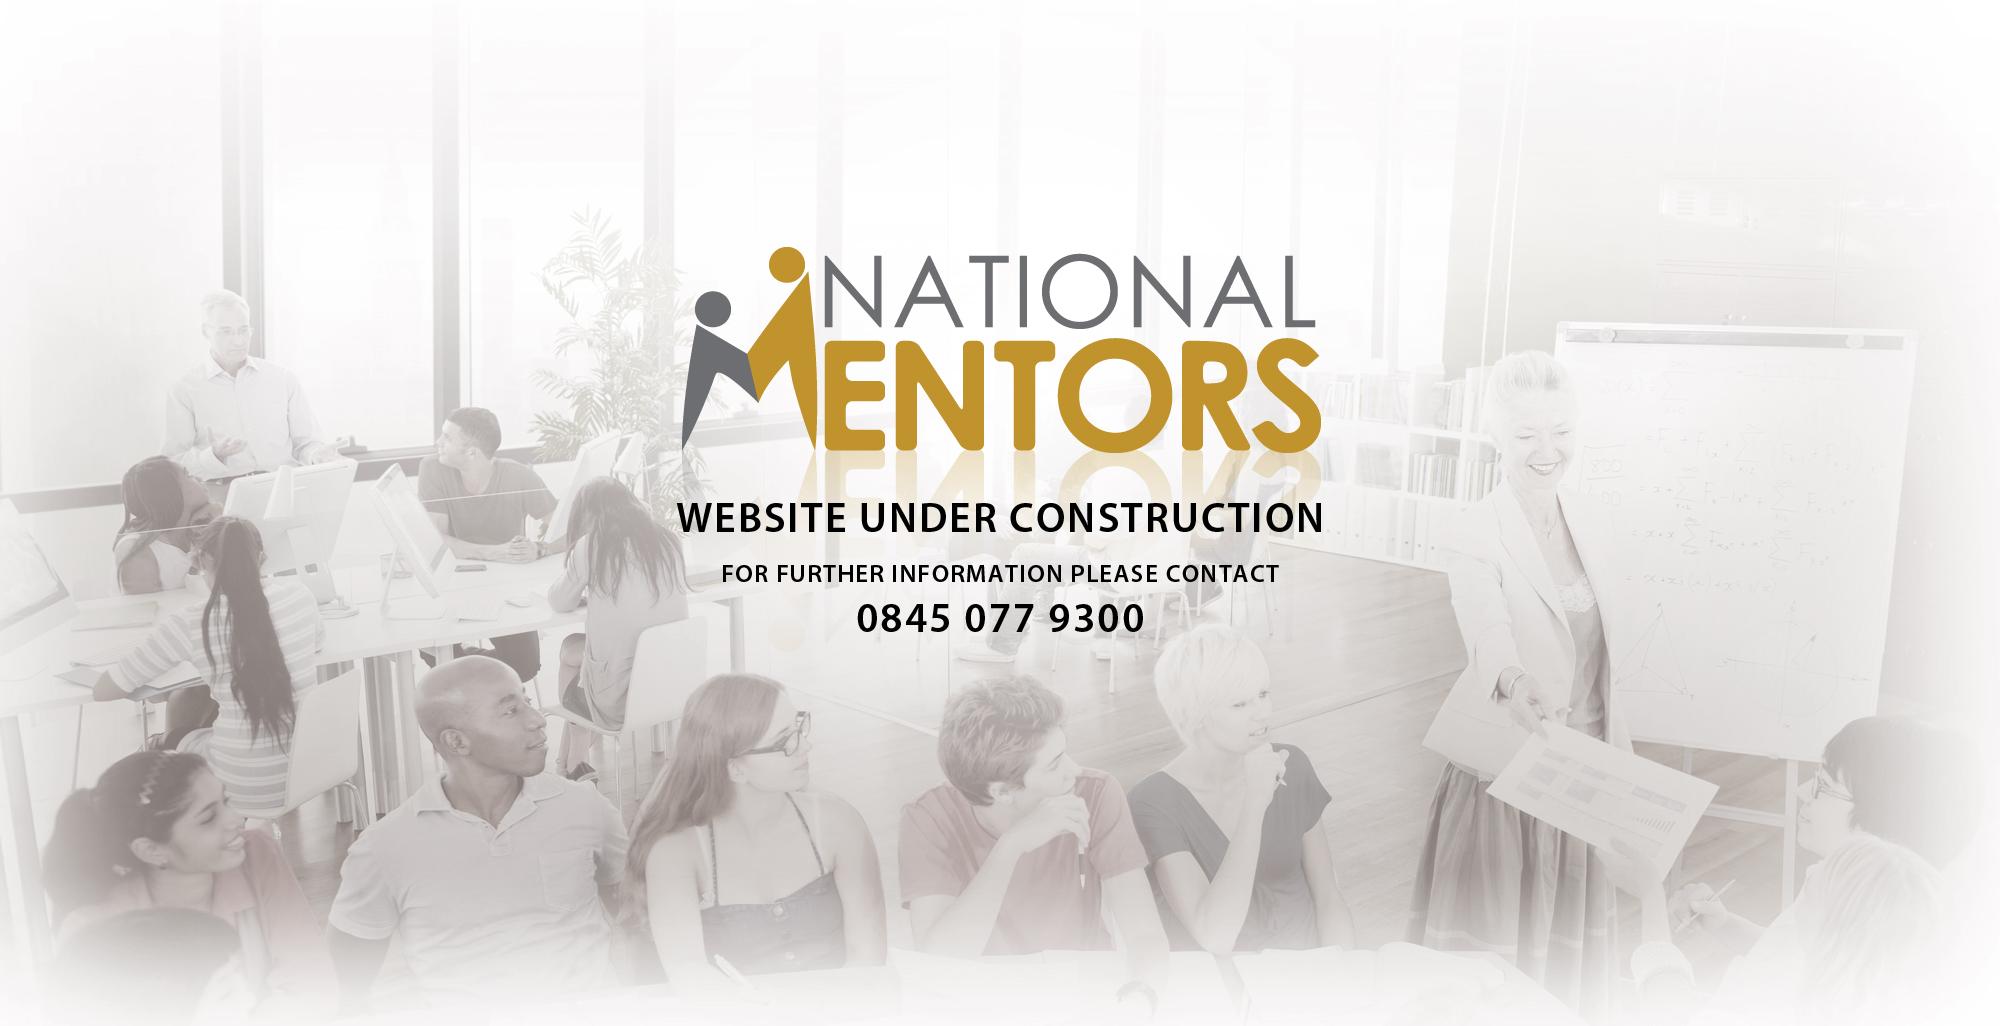 National Mentors Website Under Construction